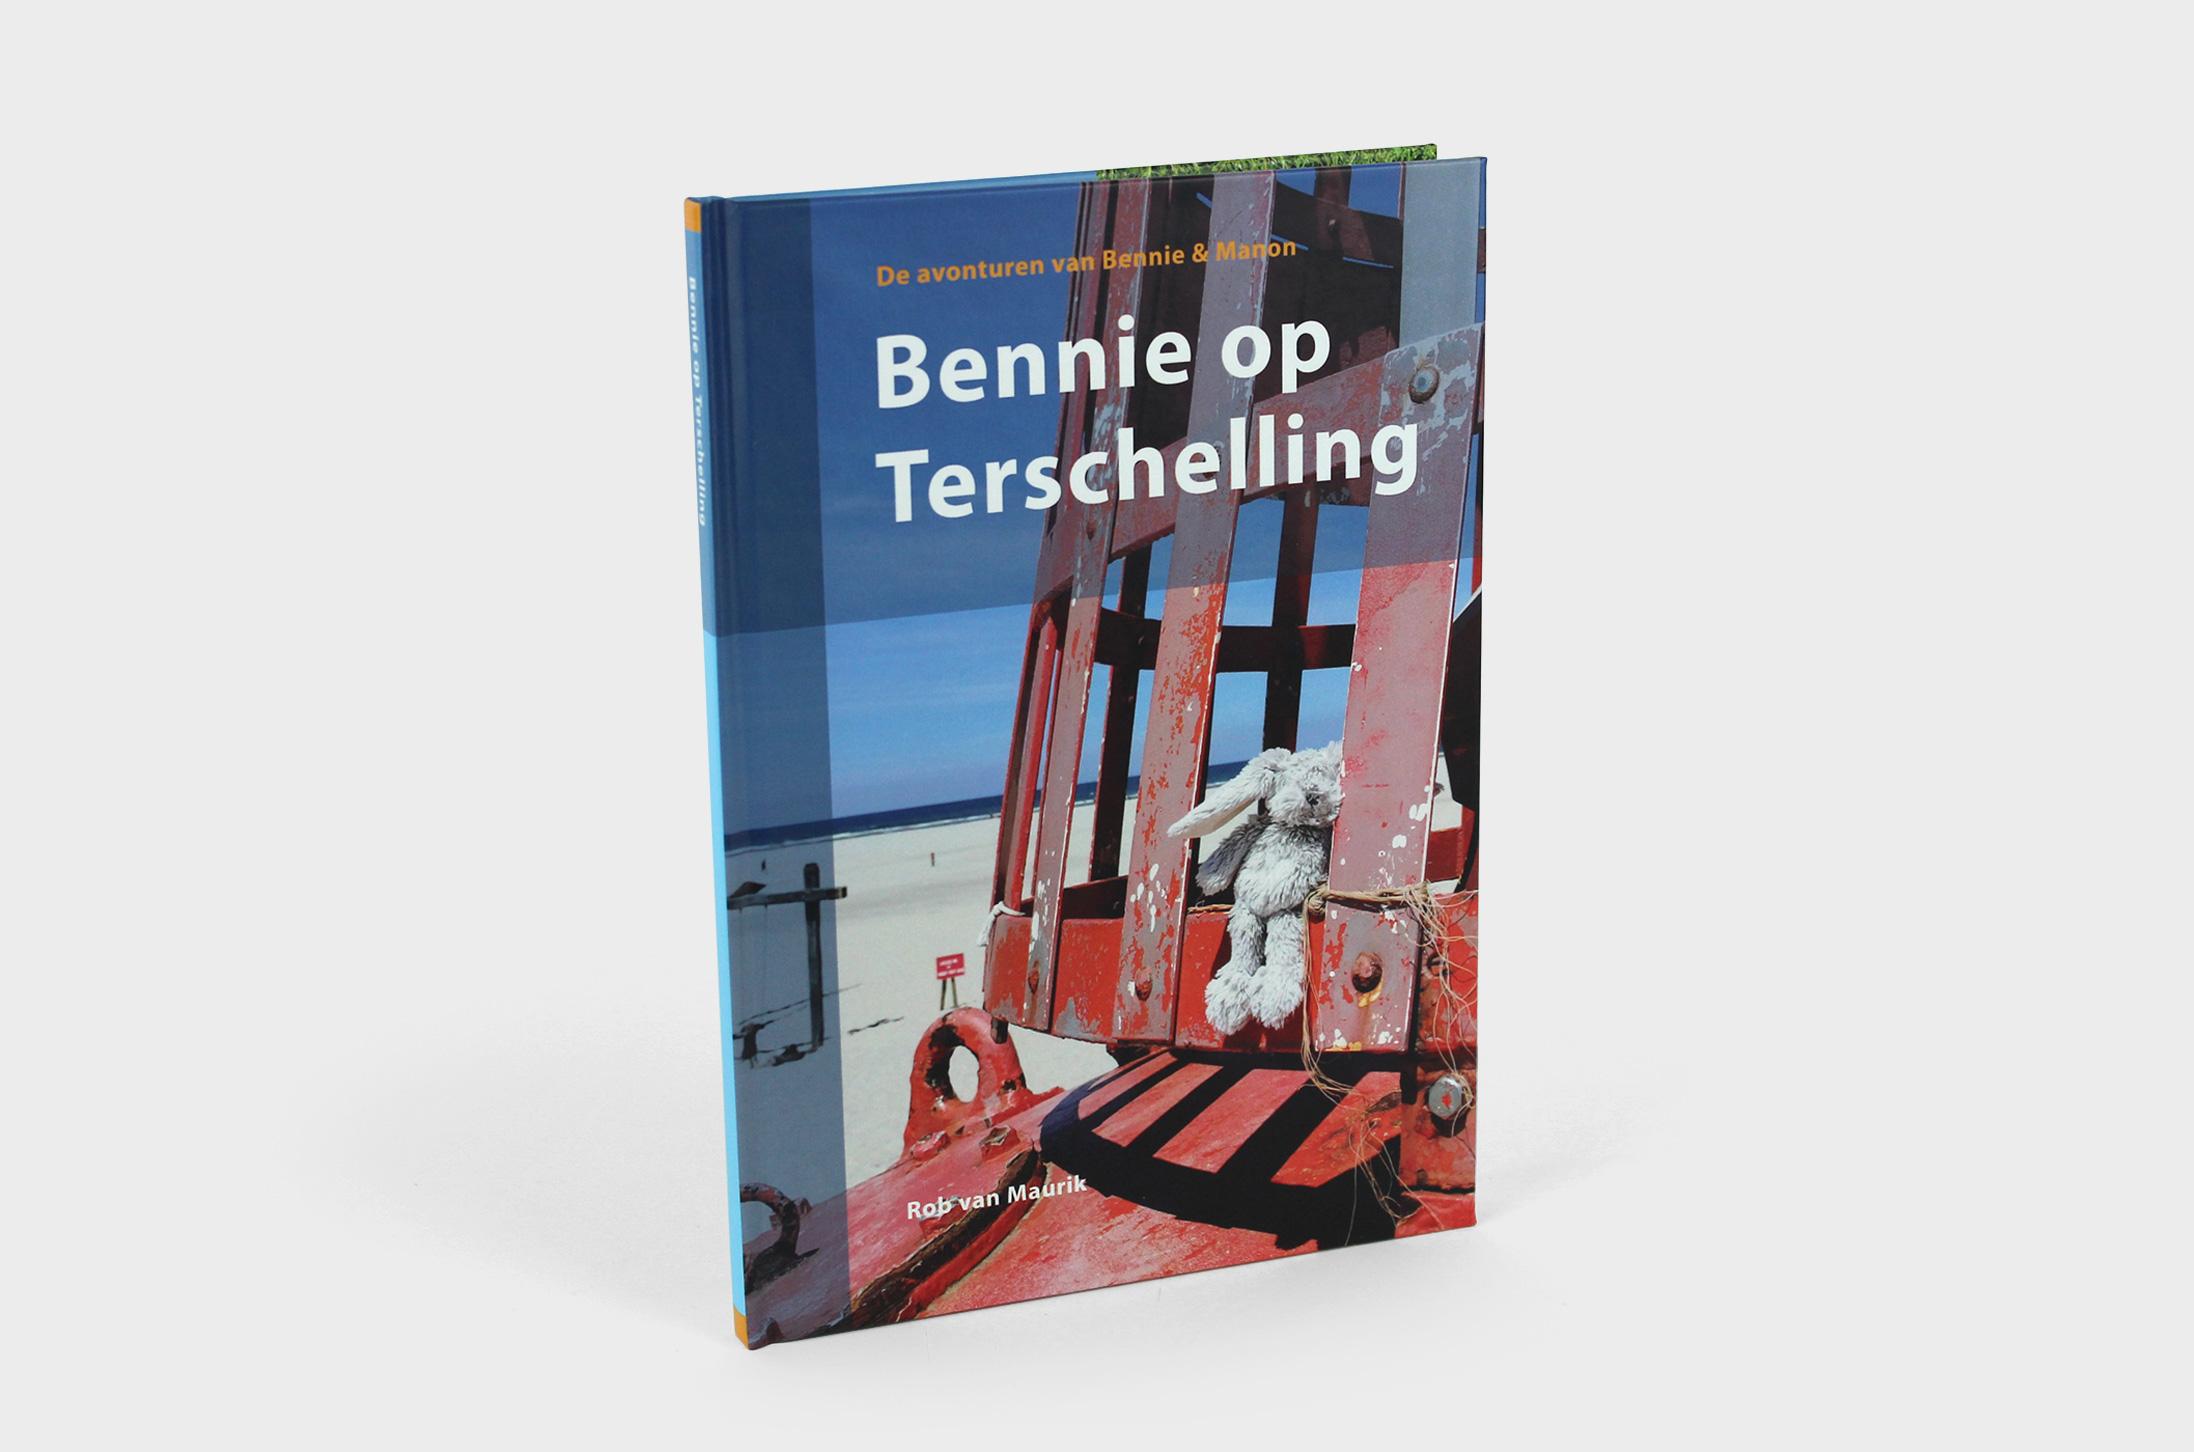 Bennie op Terschelling